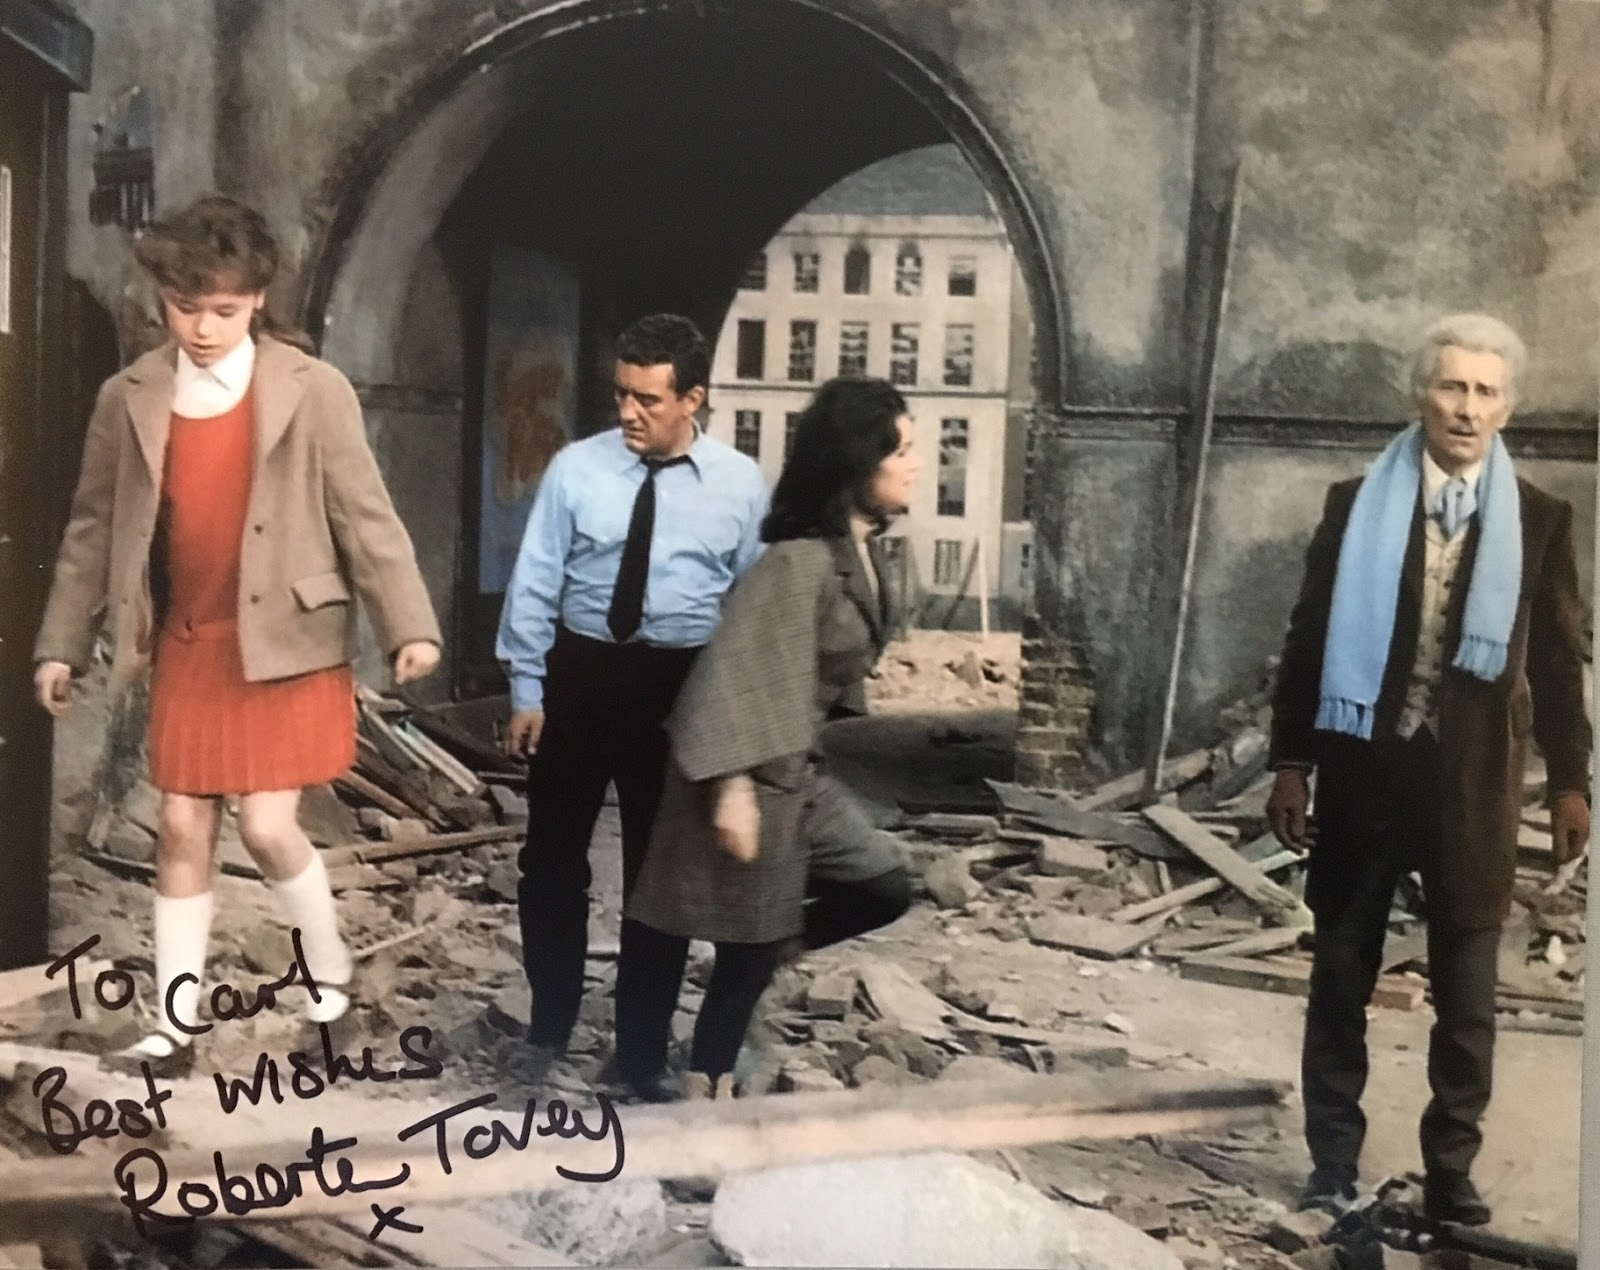 Watch Roberta Tovey video